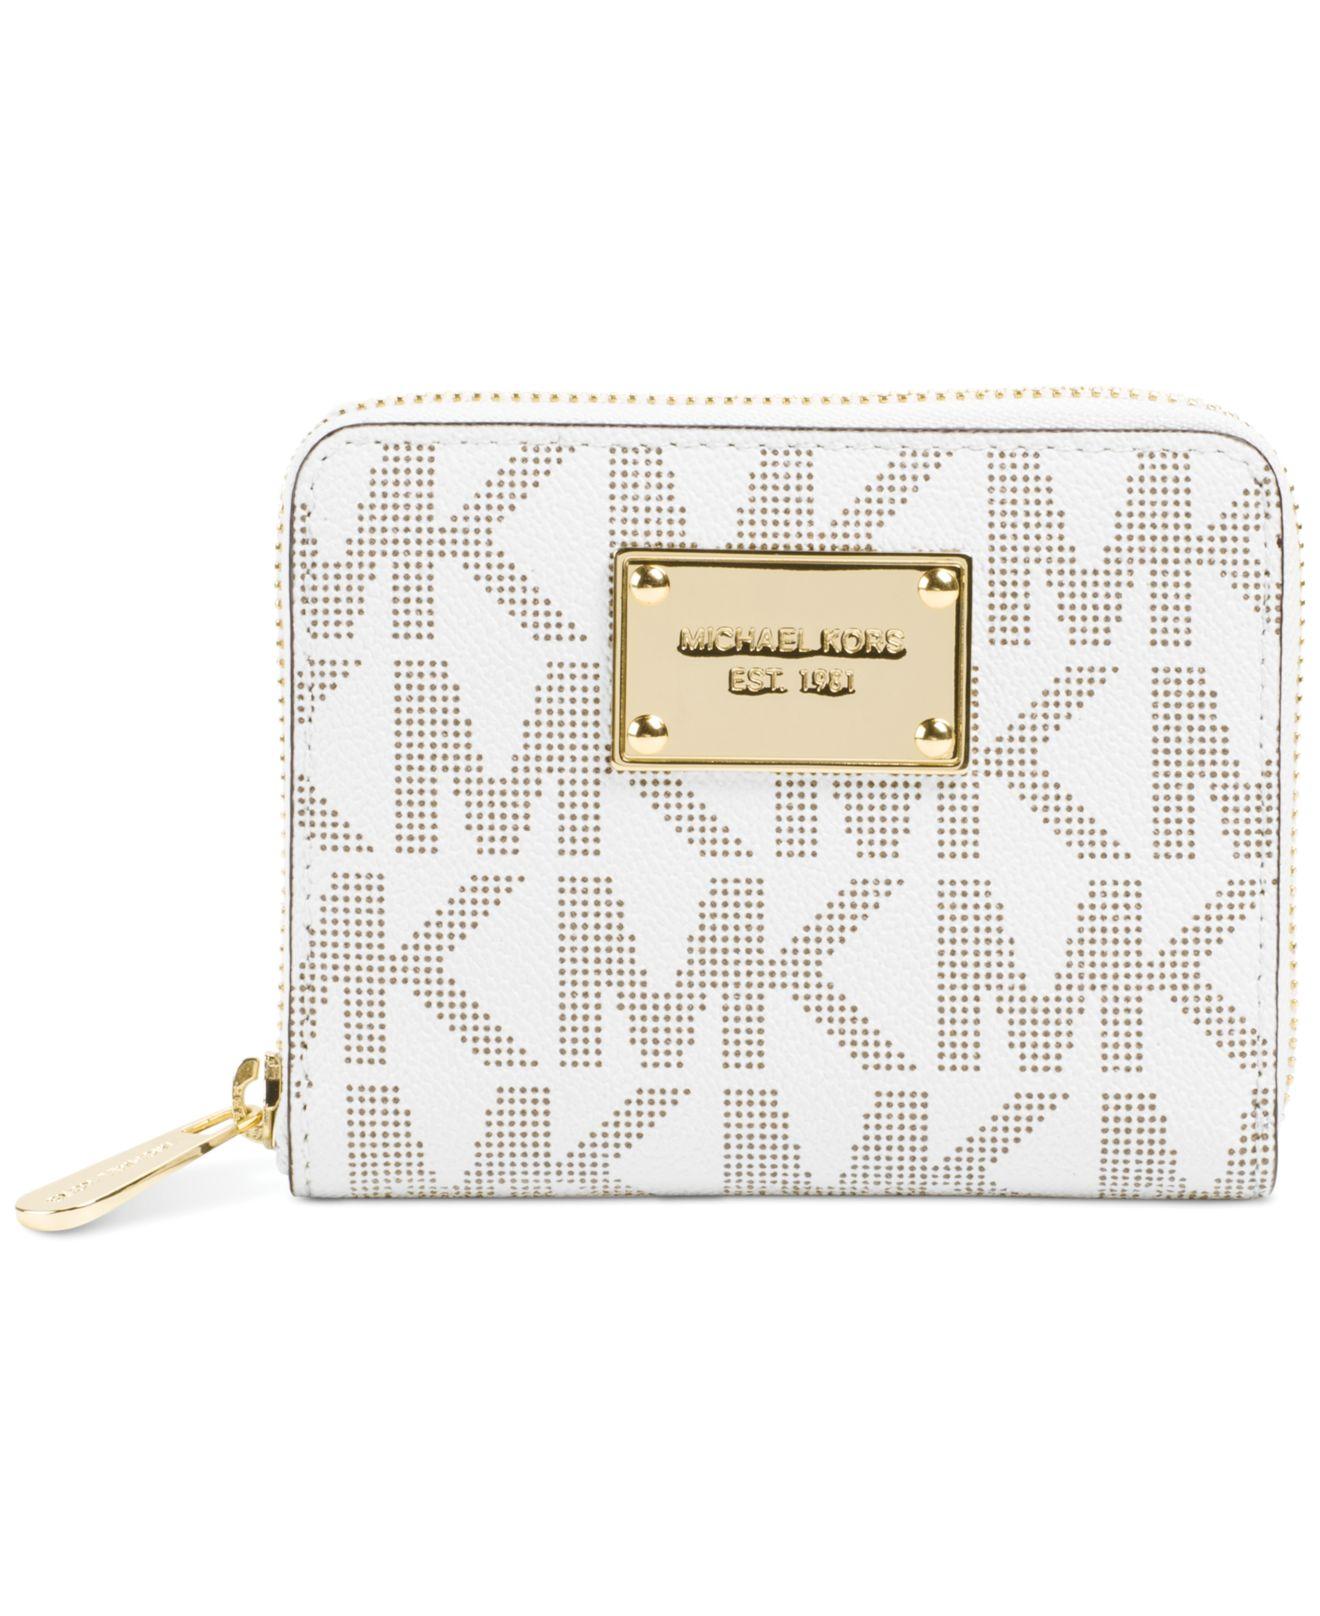 92a4863742e4 Michael Kors Michael Jet Set Item Medium Zip Around Wallet in White ...